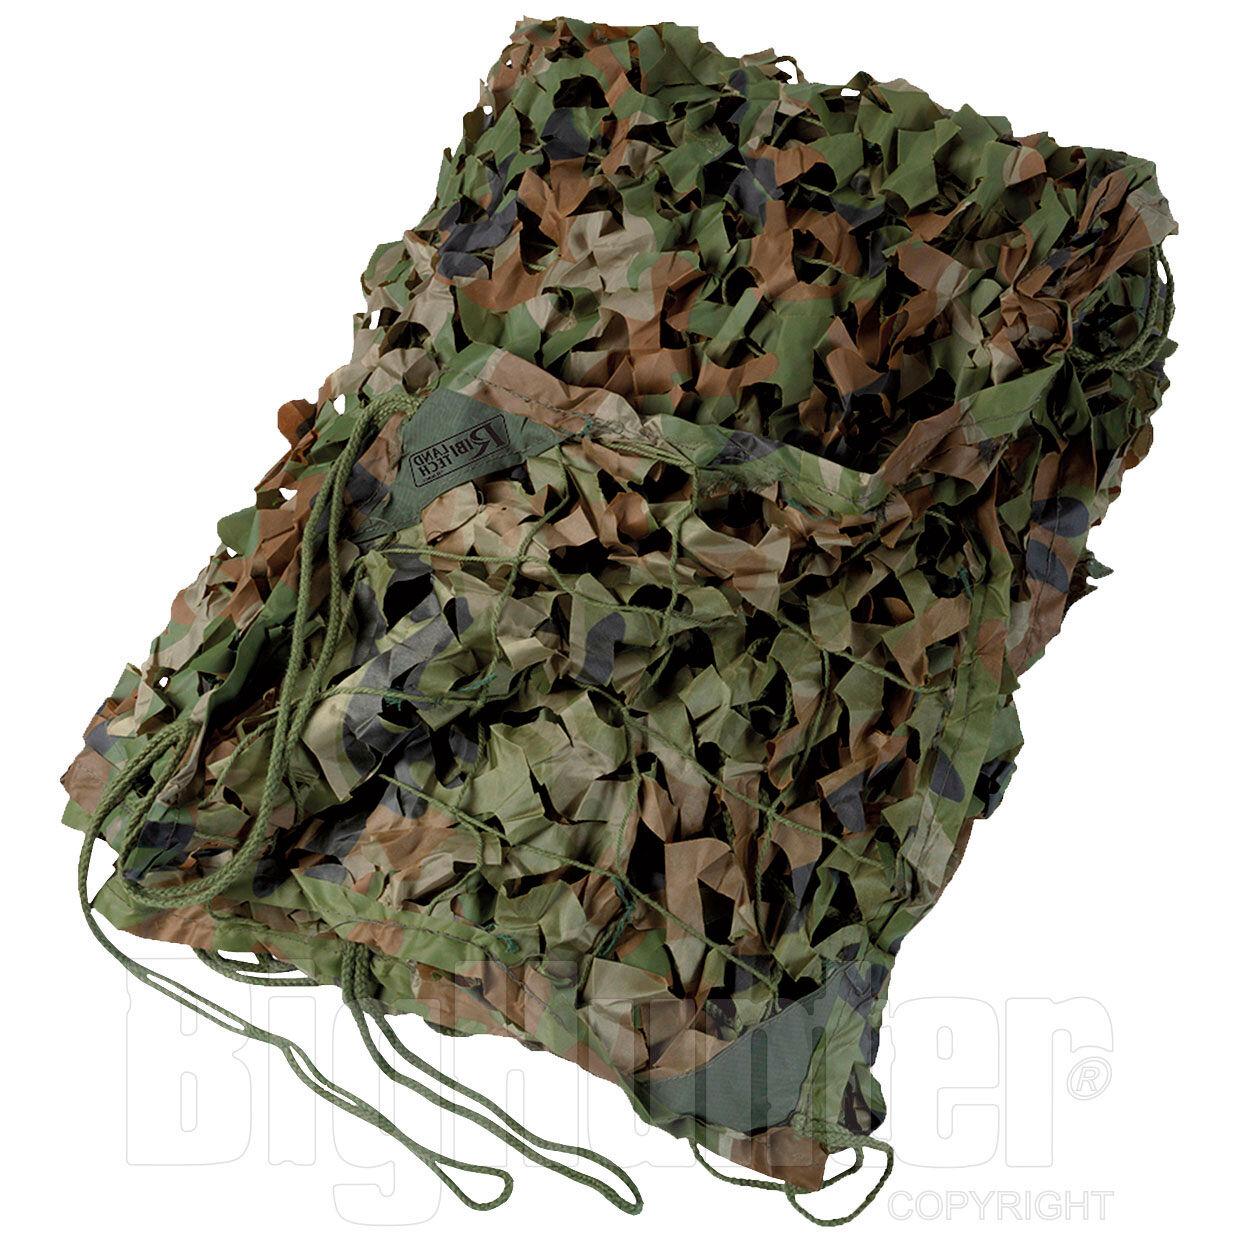 Rete Camouflage Ribimex 4x5 m